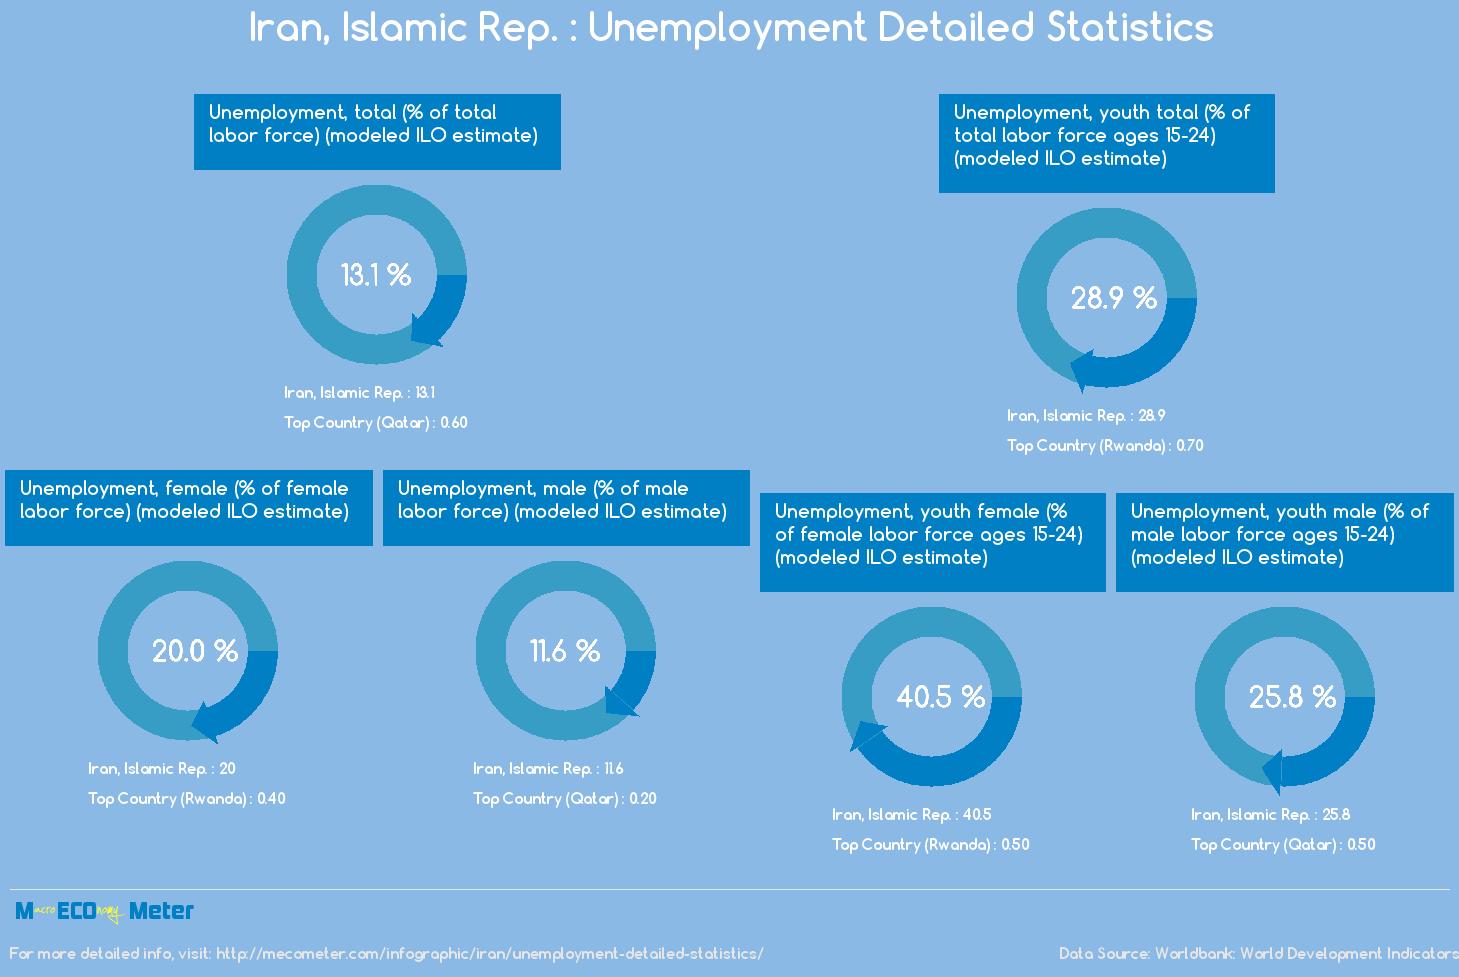 Iran, Islamic Rep. : Unemployment Detailed Statistics